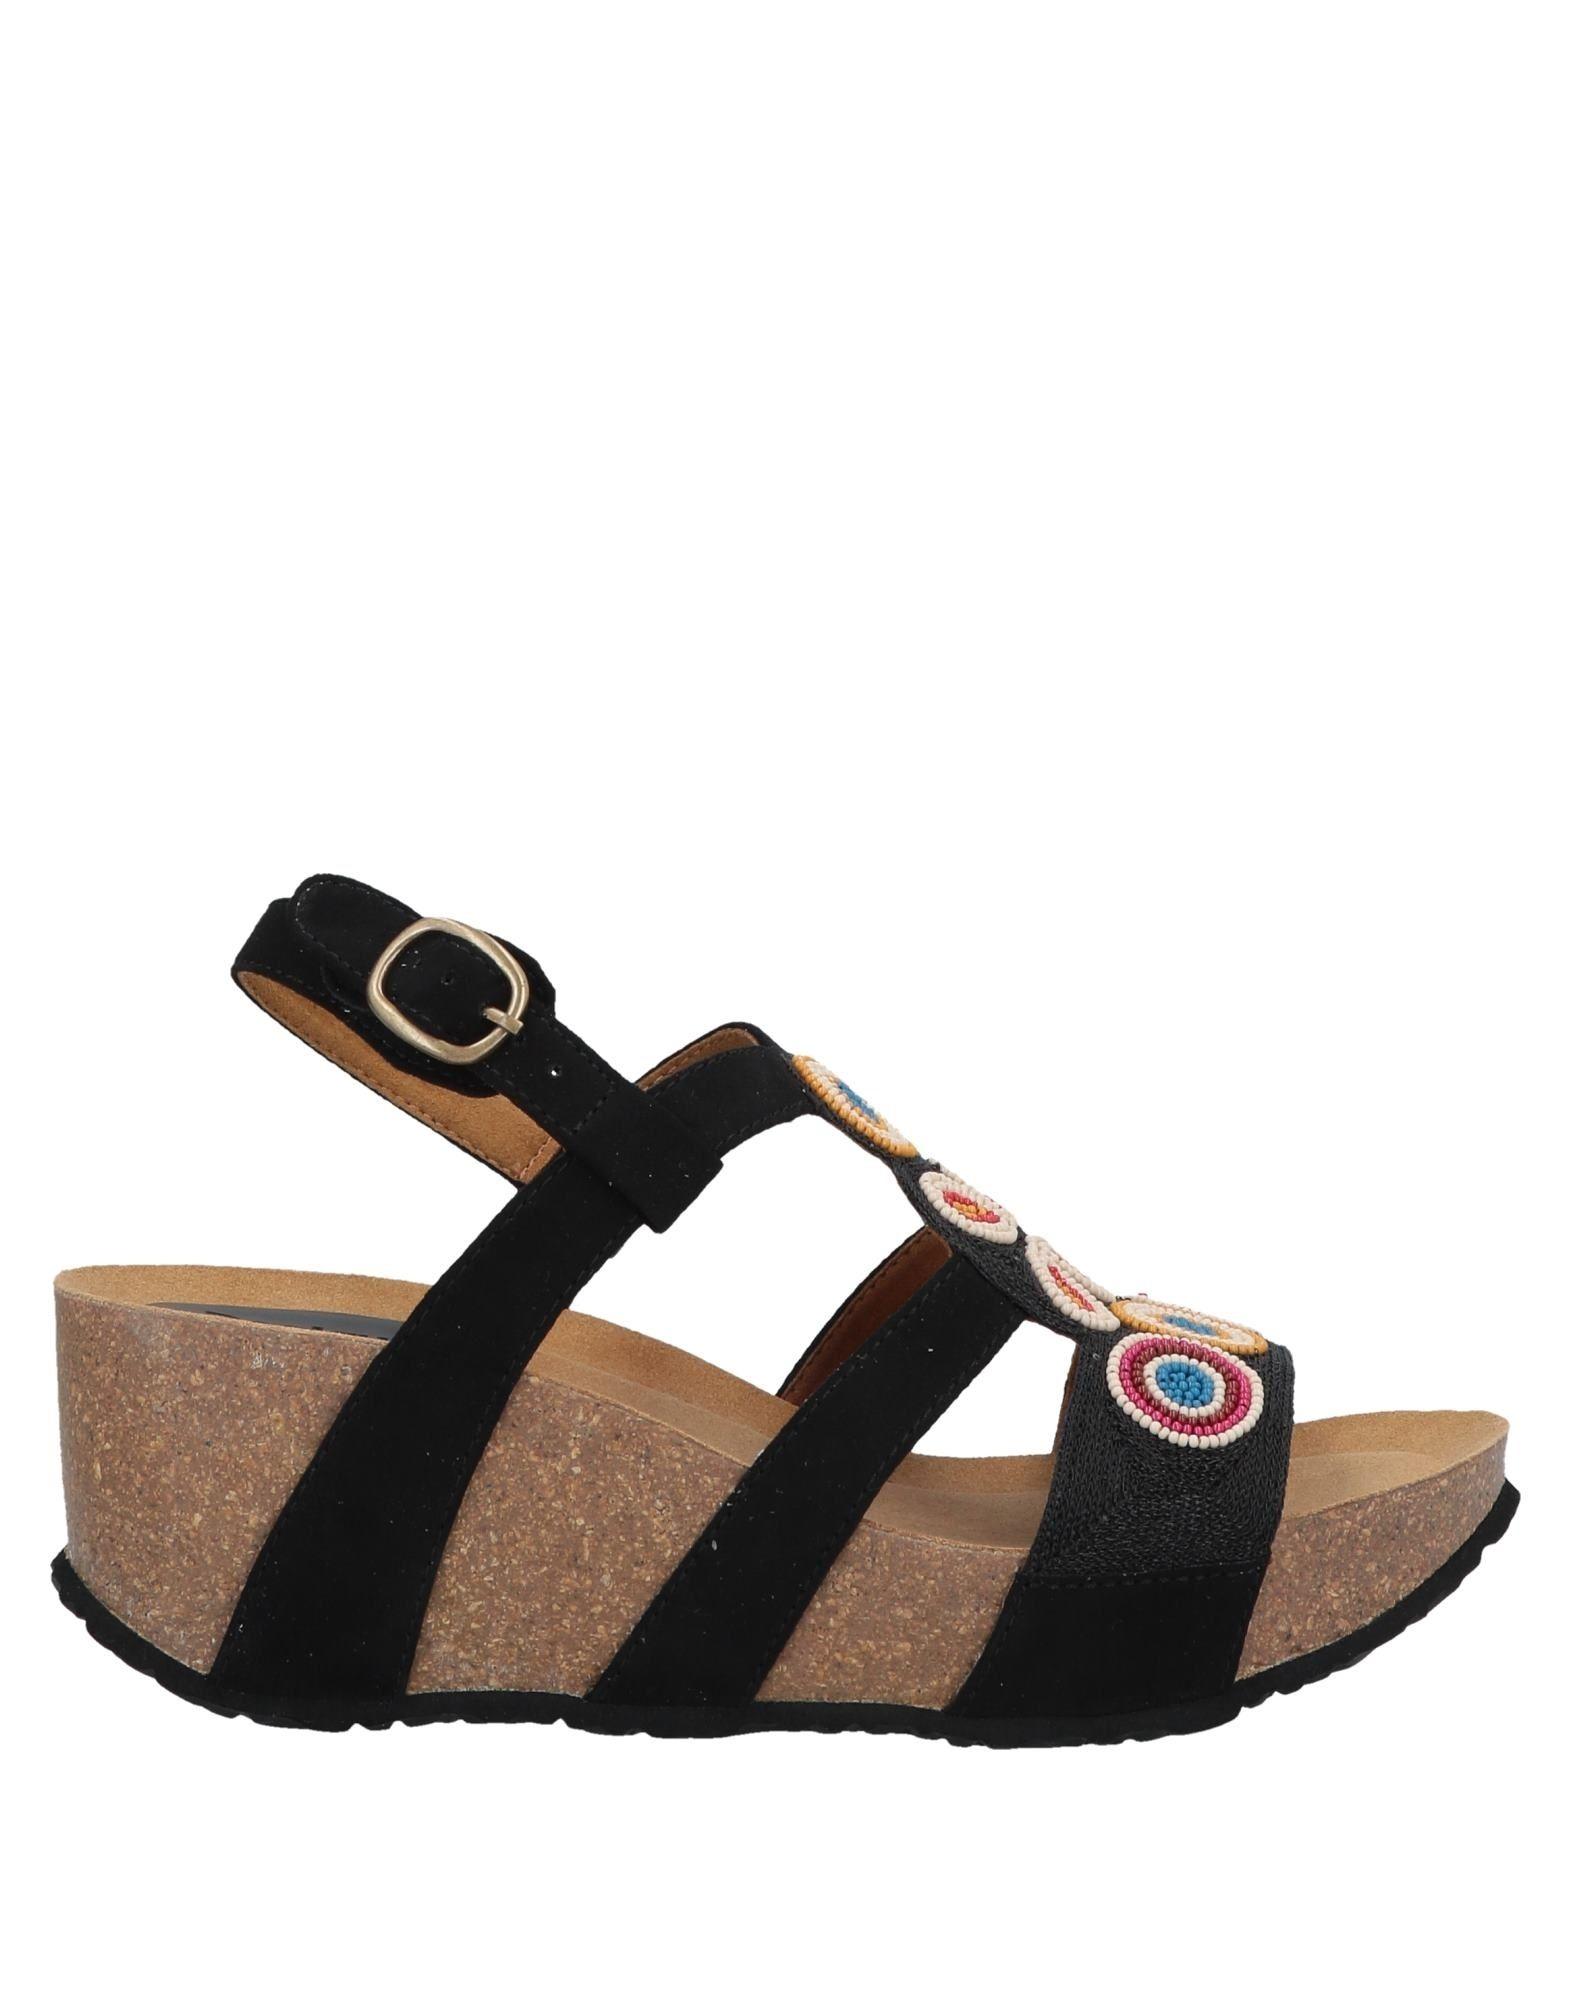 Sandales Desigual Femme - Sandales Desigual   - 11701946MU